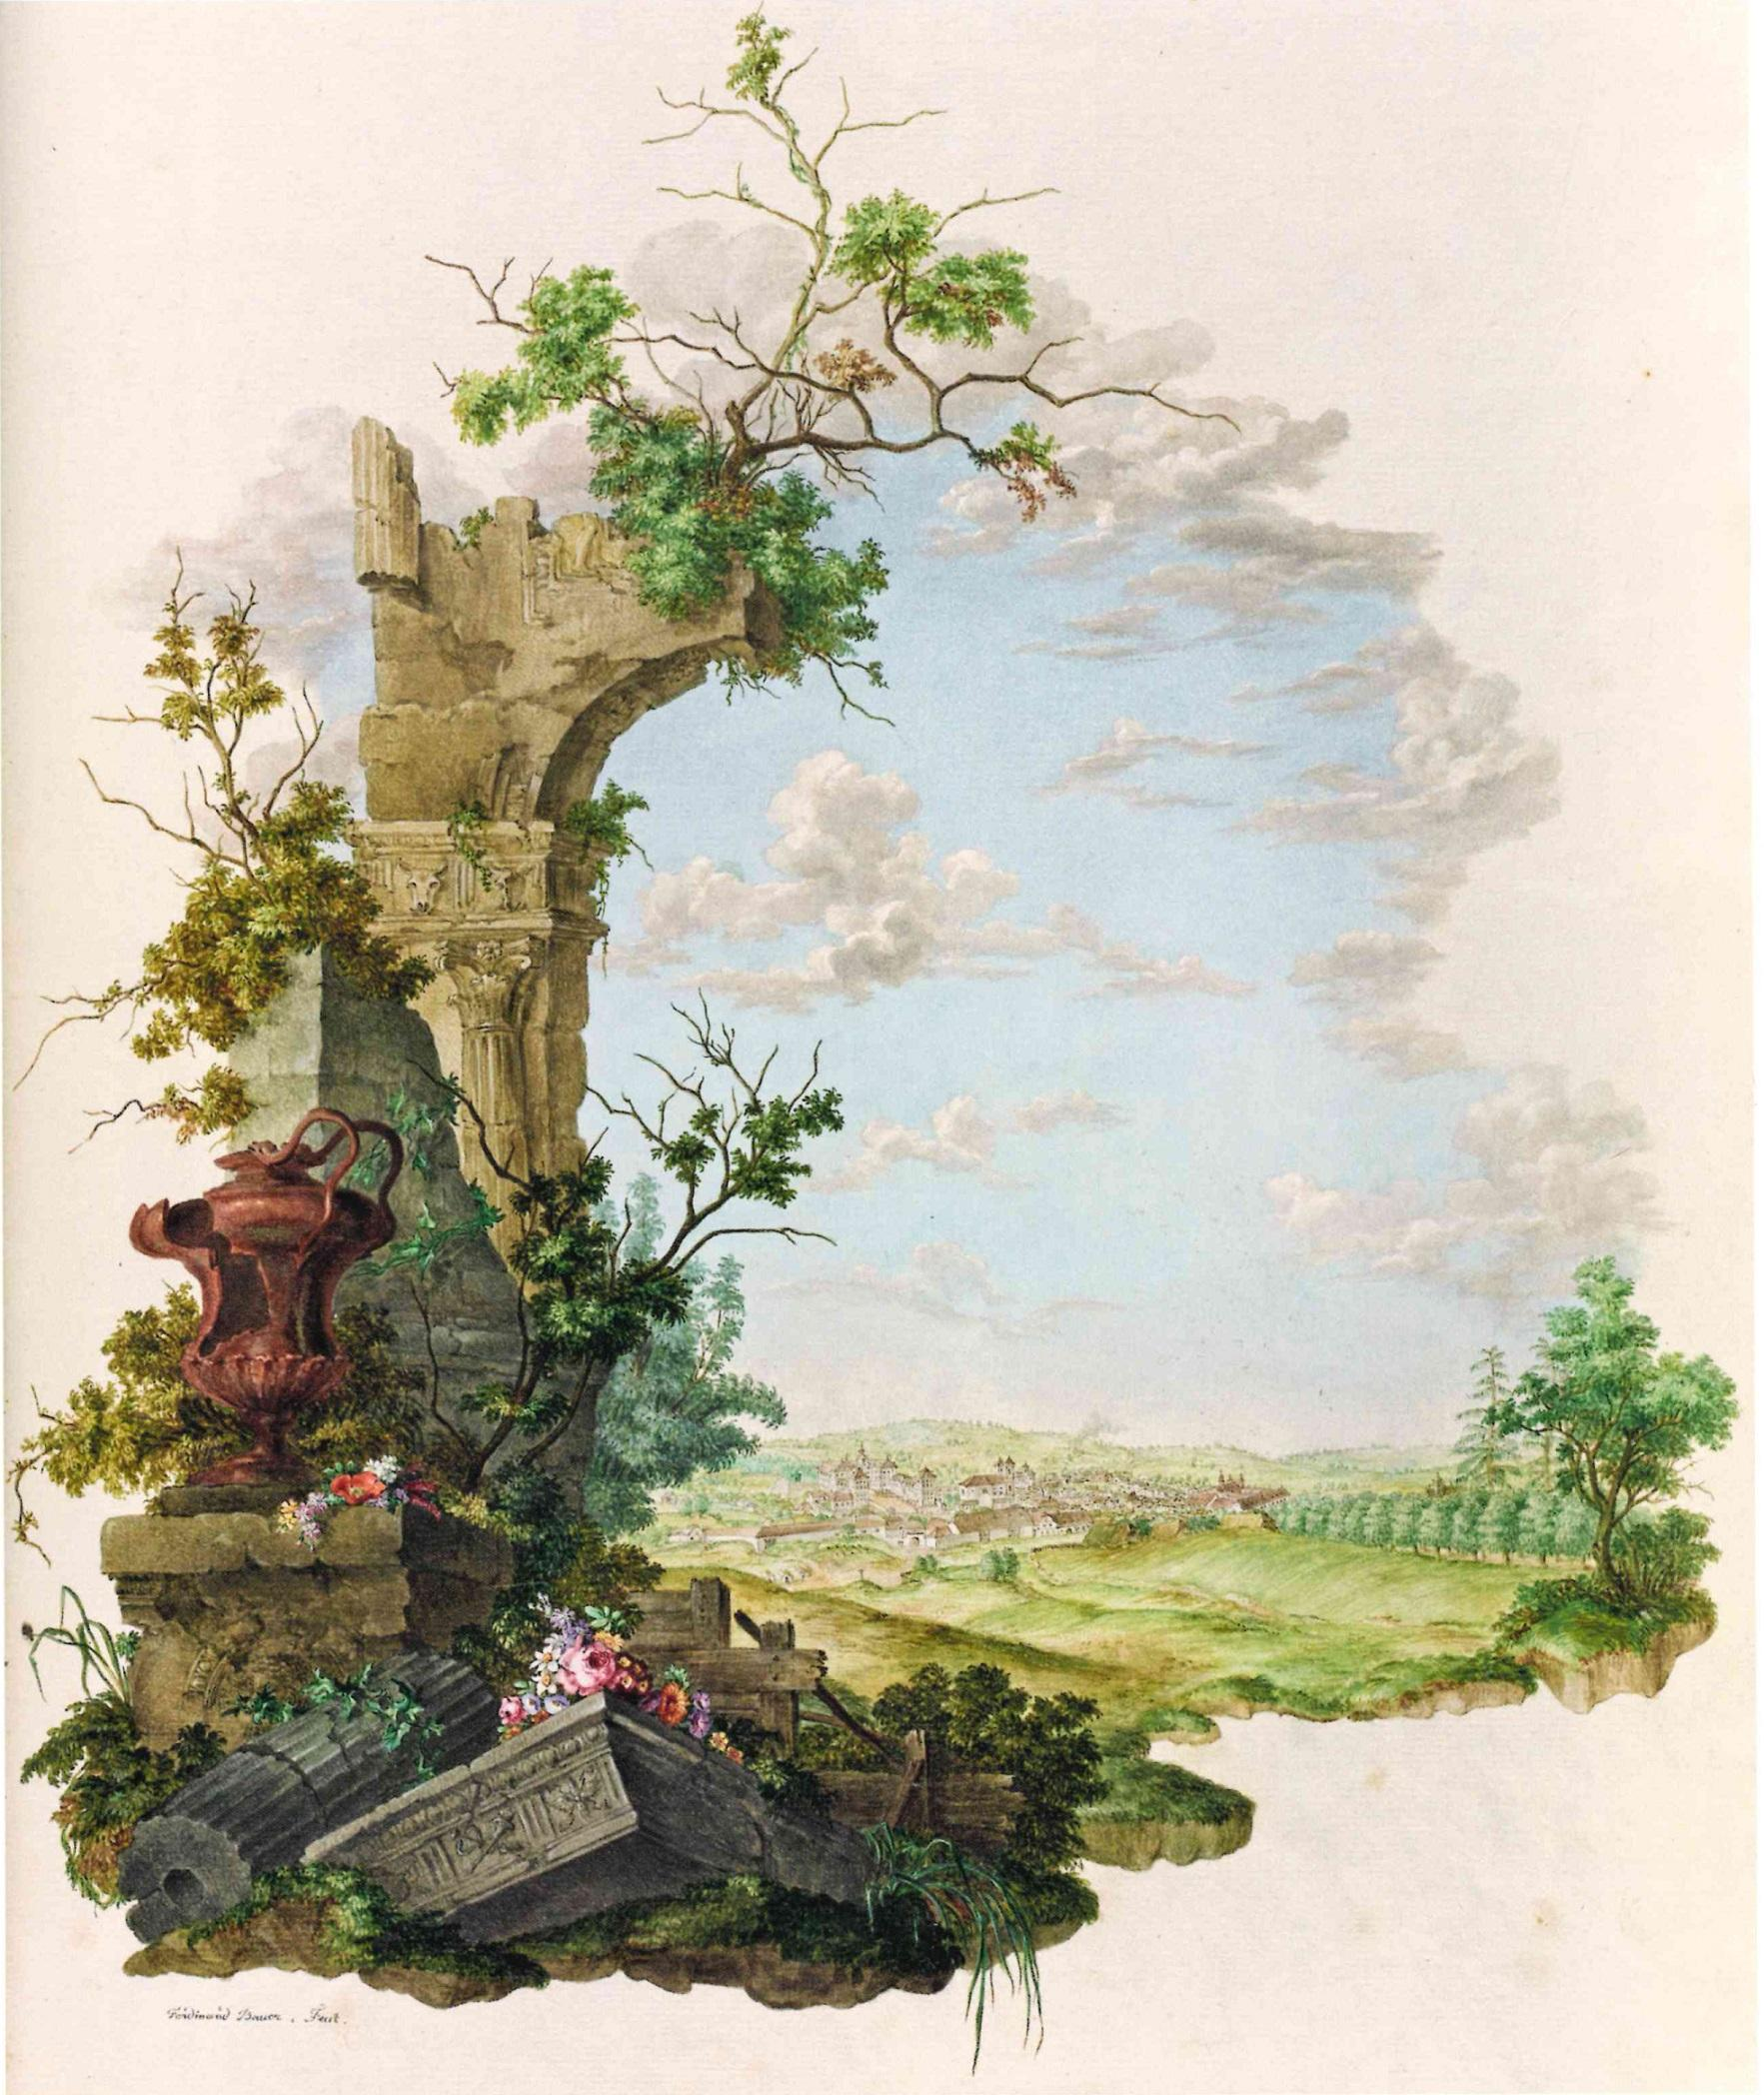 View of the town of Valtice in 1783, then called Feldsberg, watercolour by Ferdinand Bauer in Codex Liechtenstein. – © Hans Walter Lack - The Bauers